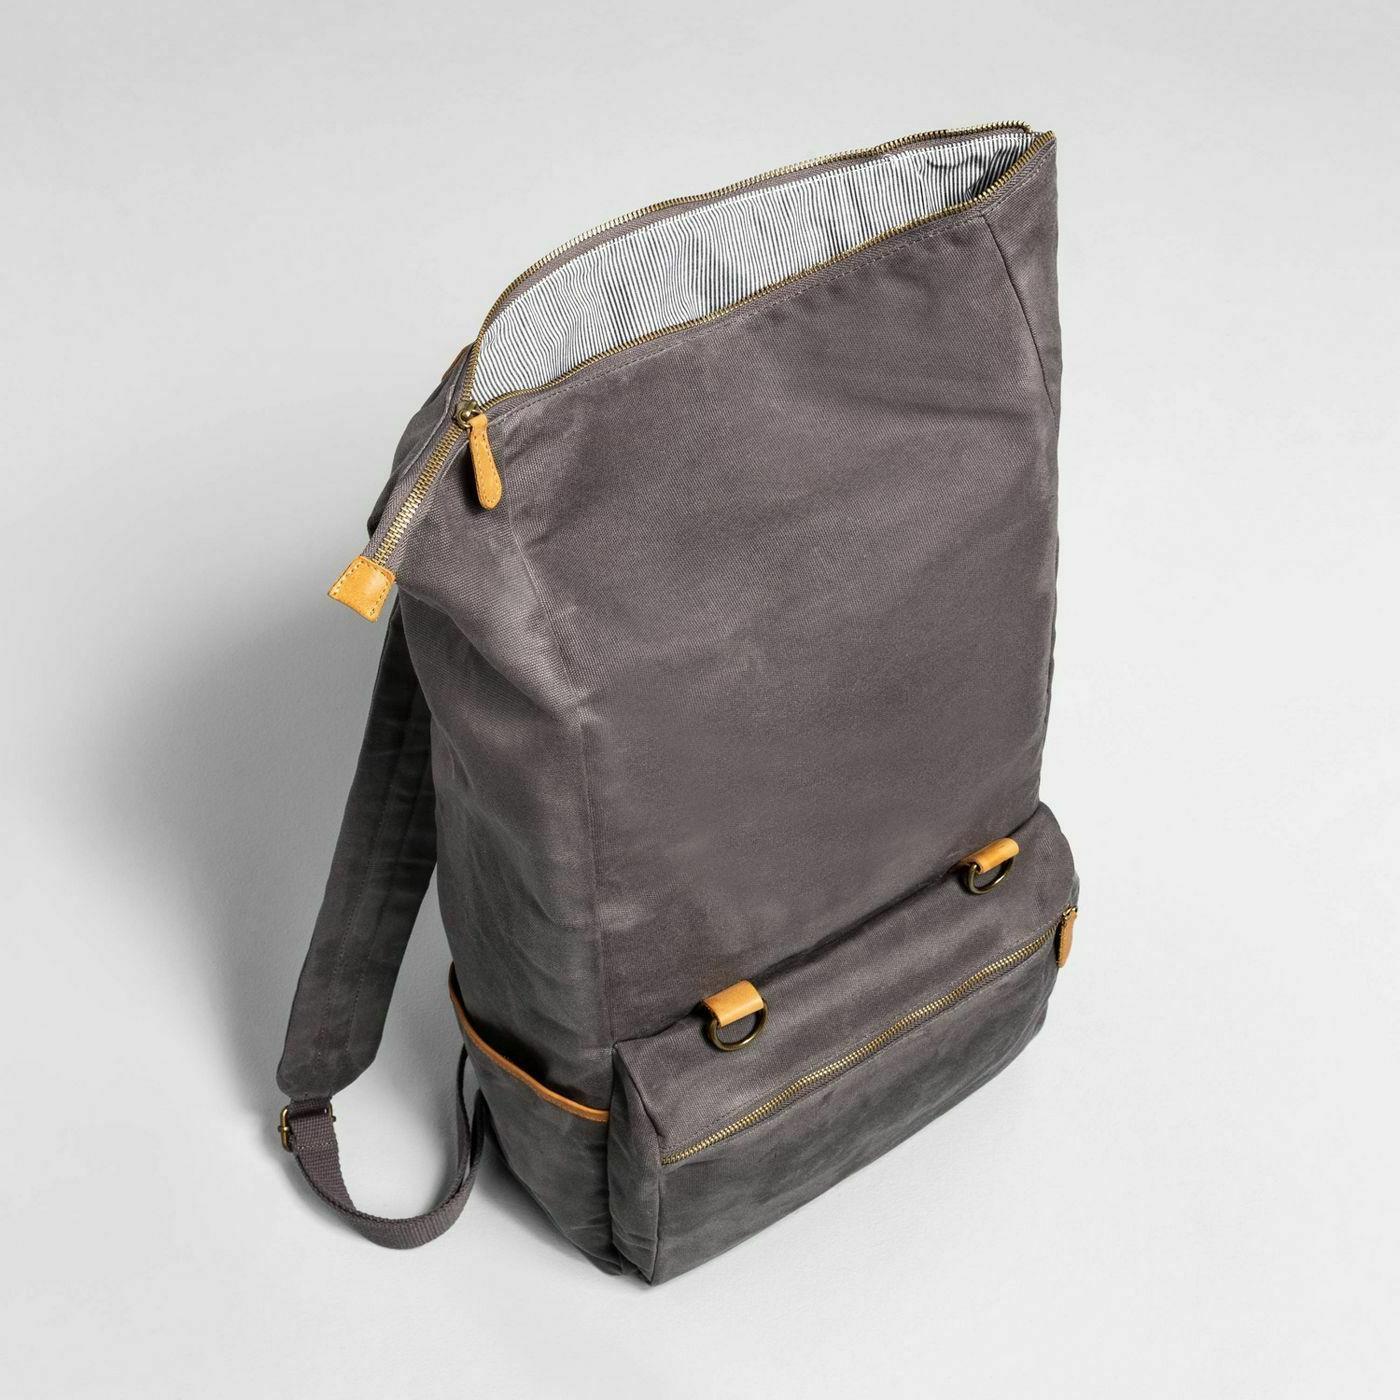 Hearth & Magnolia Gray Backpack Canvas retail at Target!